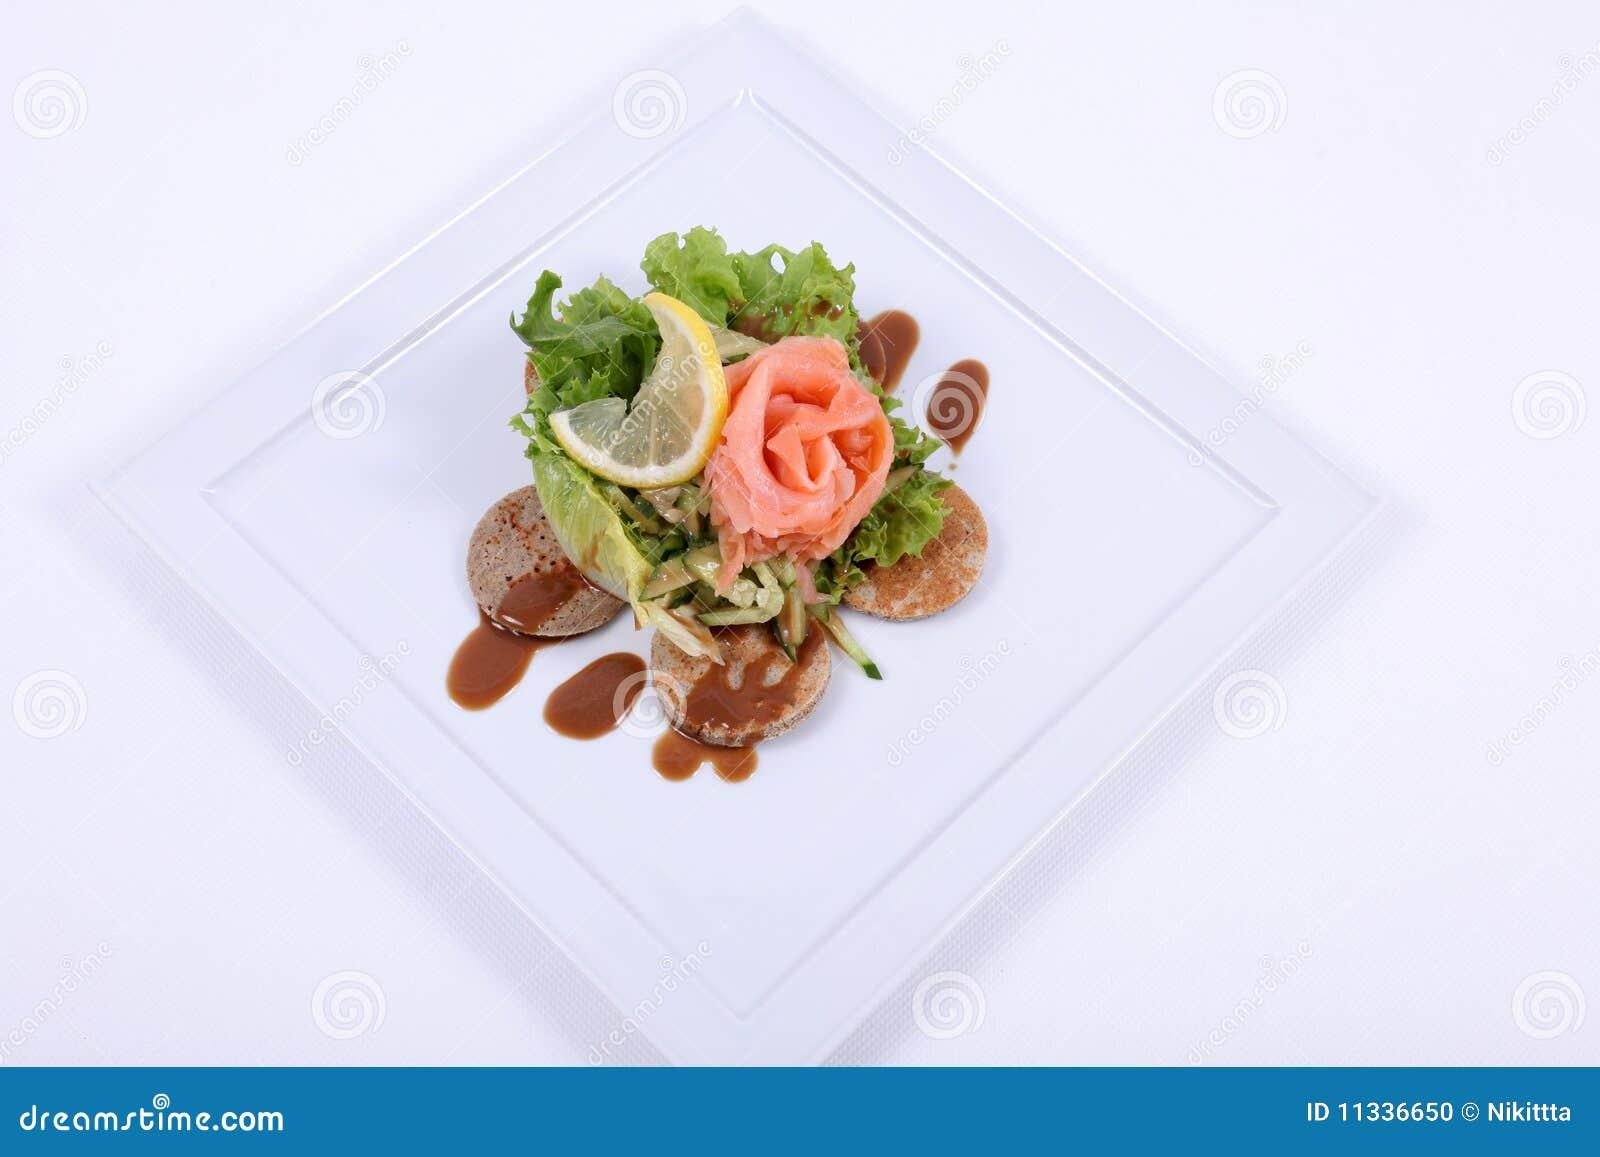 Plaque de repas dinant fin